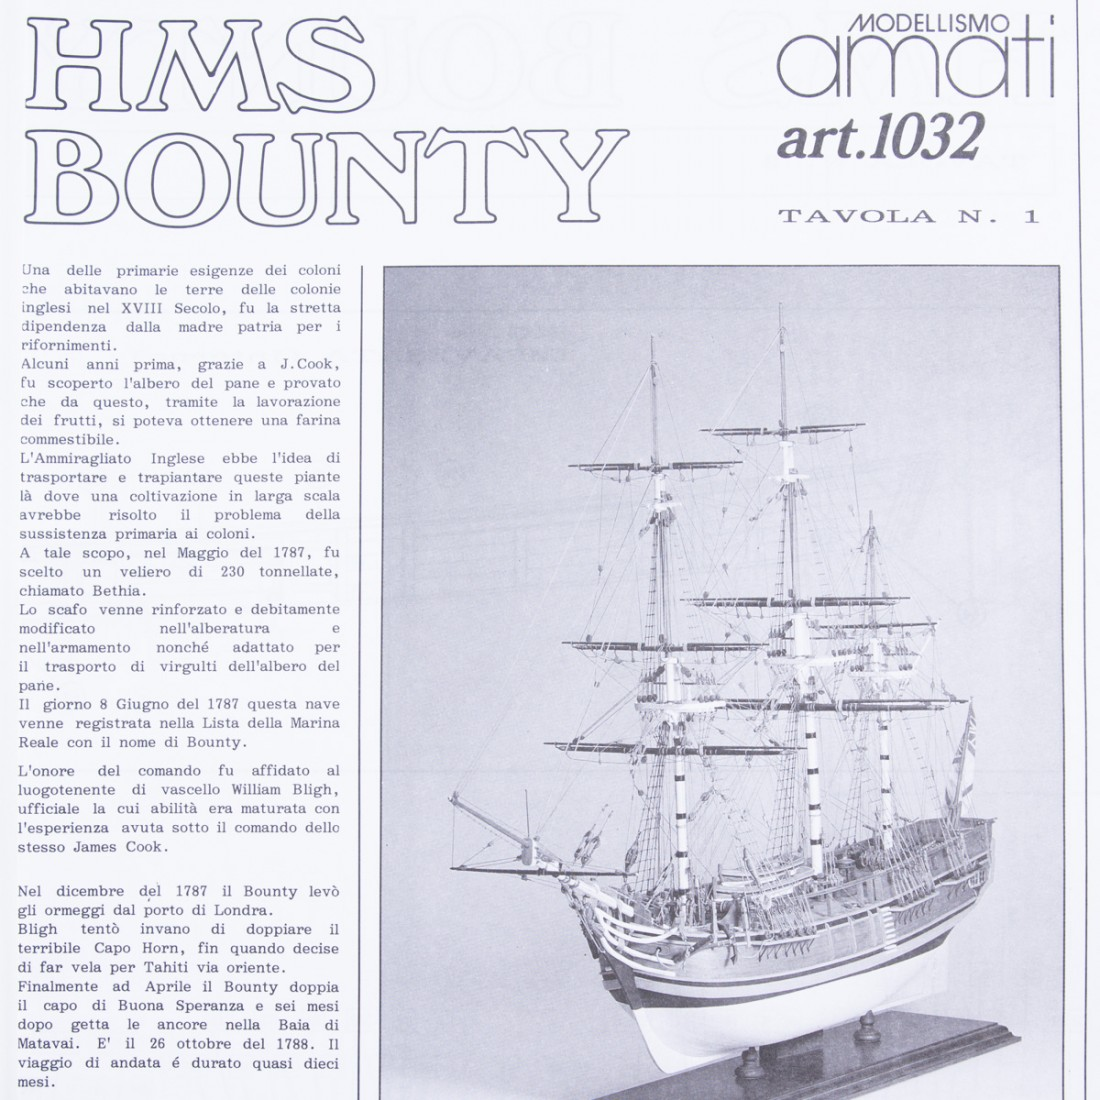 Plan H.M.S. Bounty